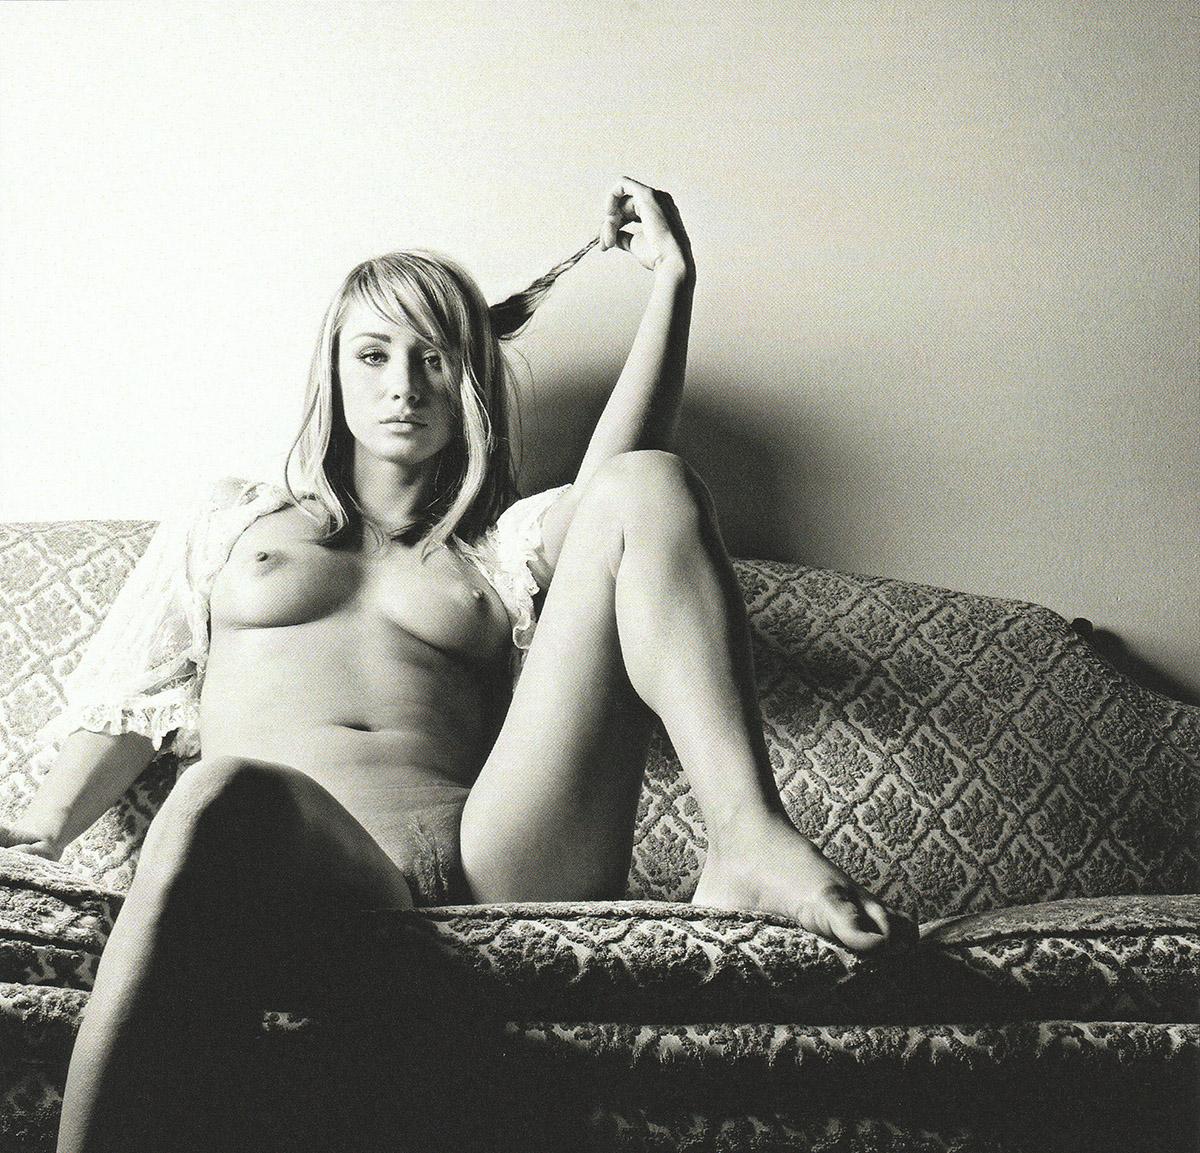 Sara Underwood Nude Photos The Fappening